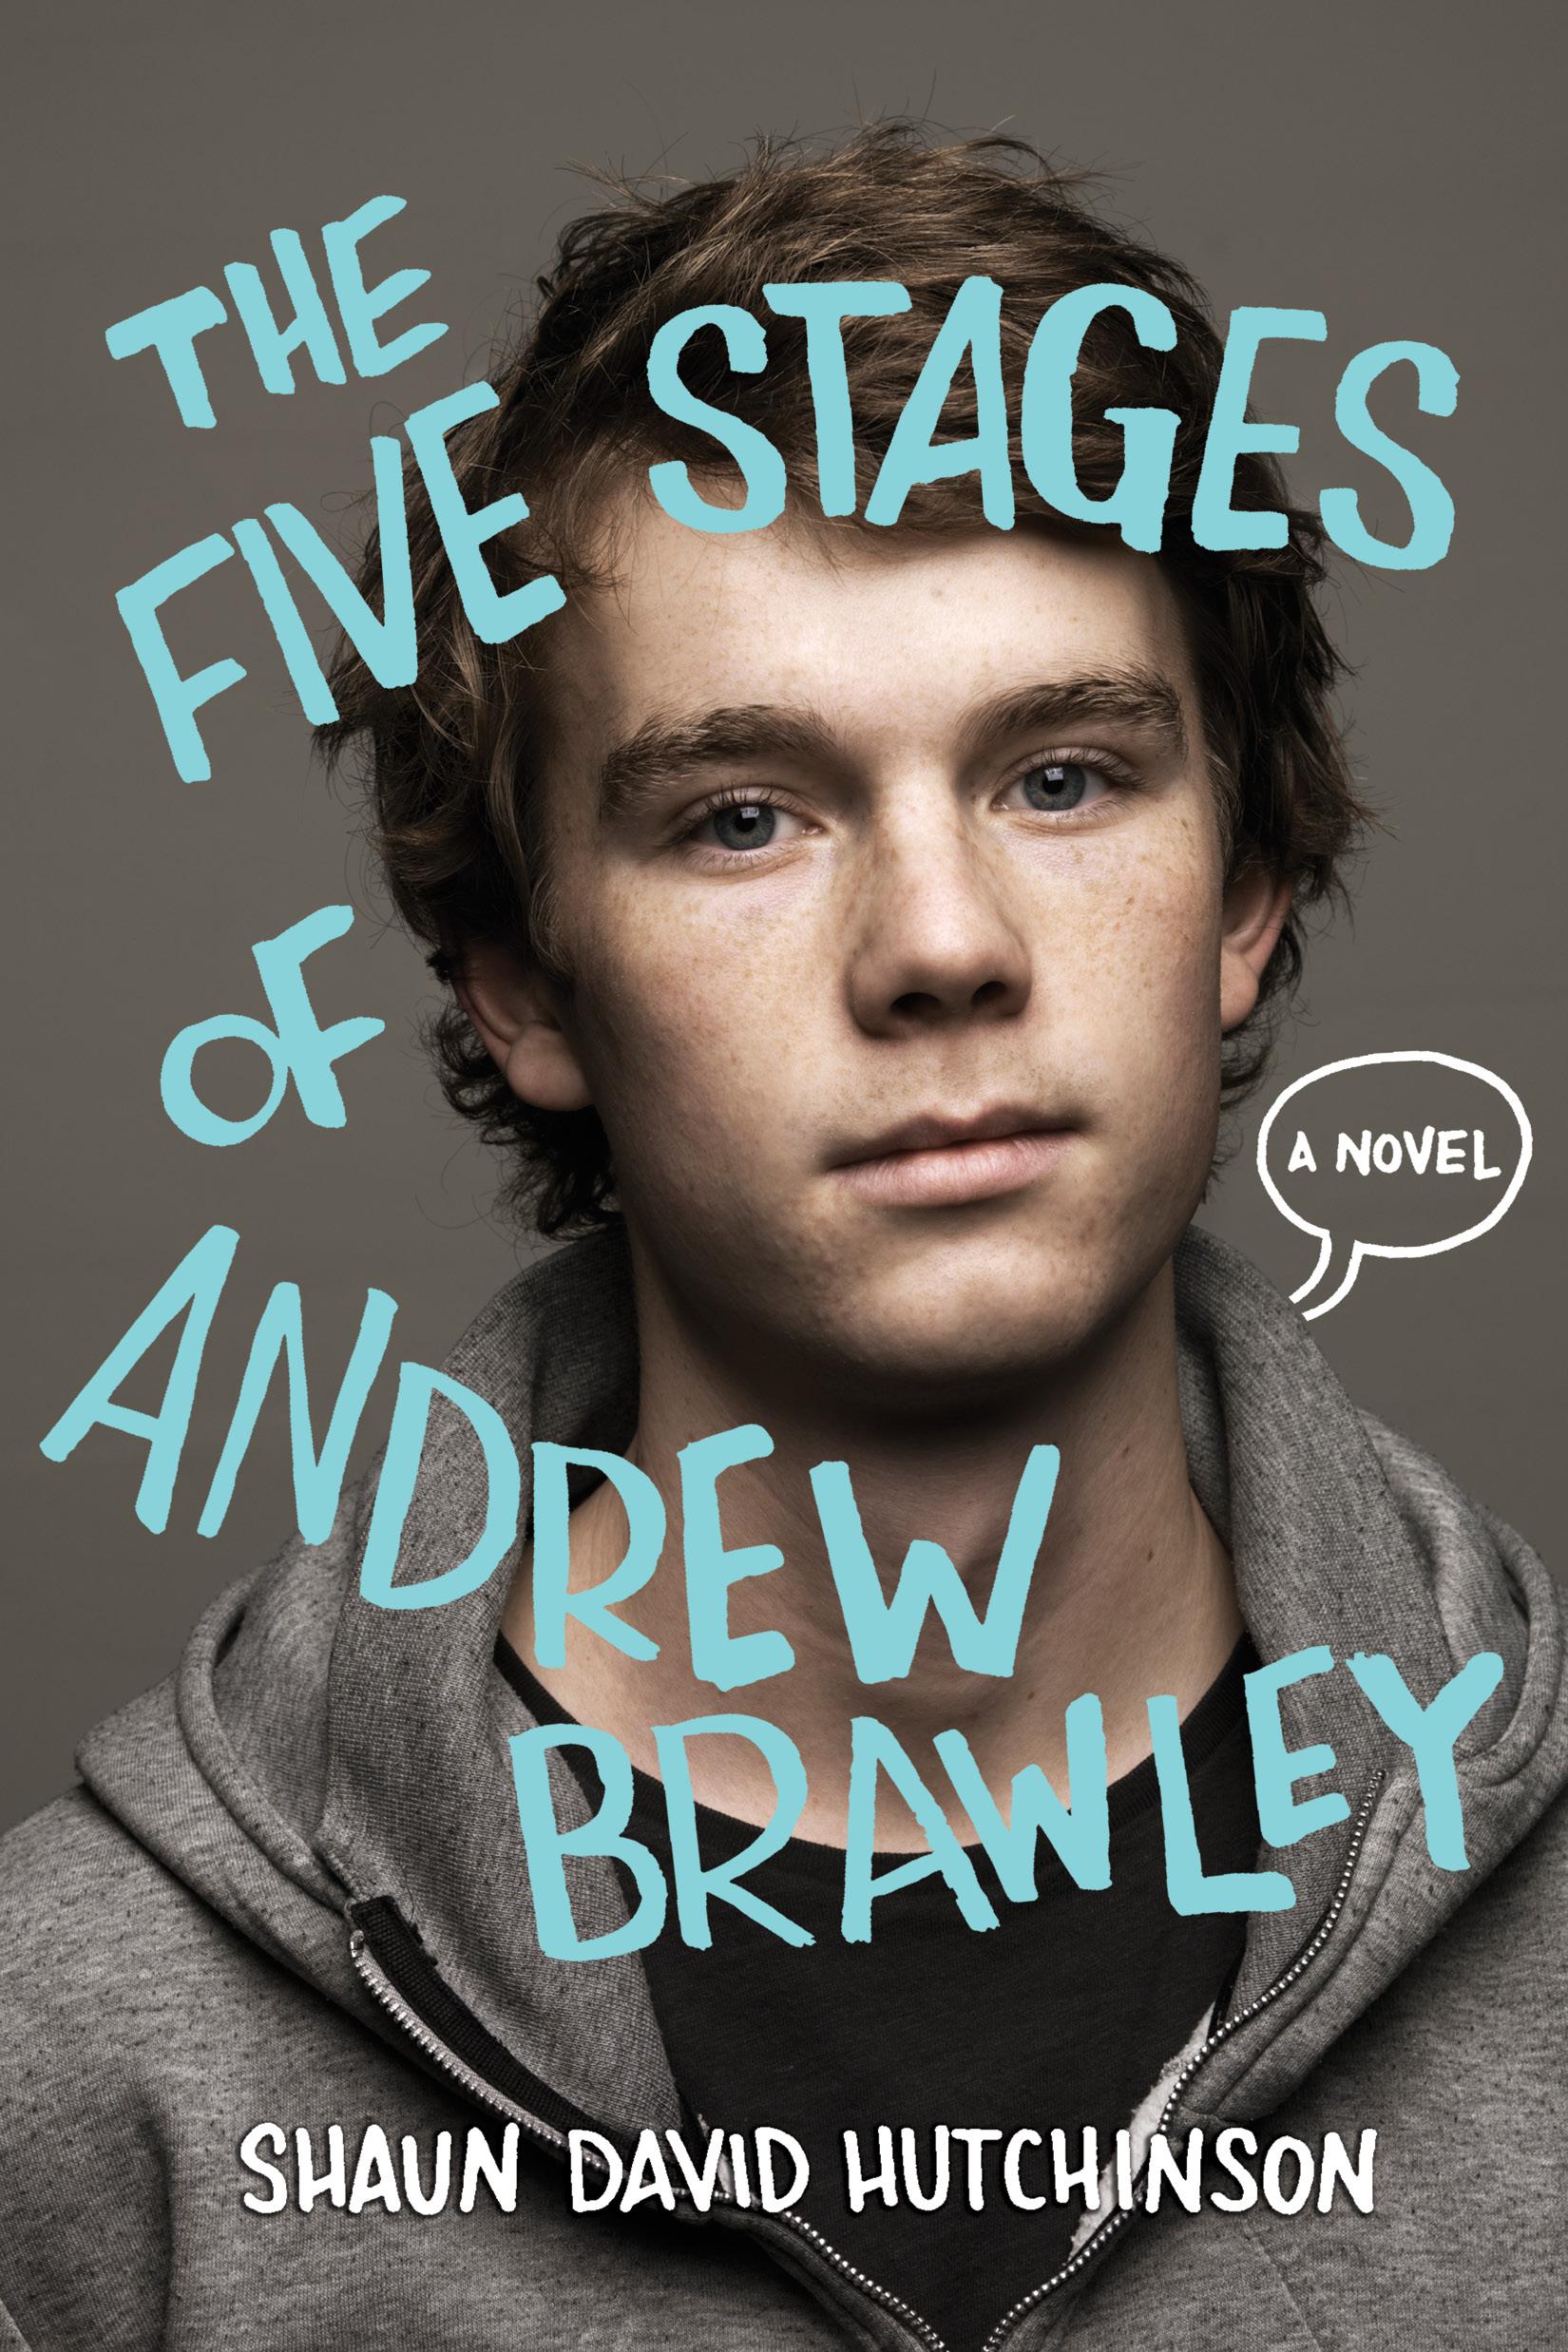 shaun-david-hutchinson-five-stages.jpg